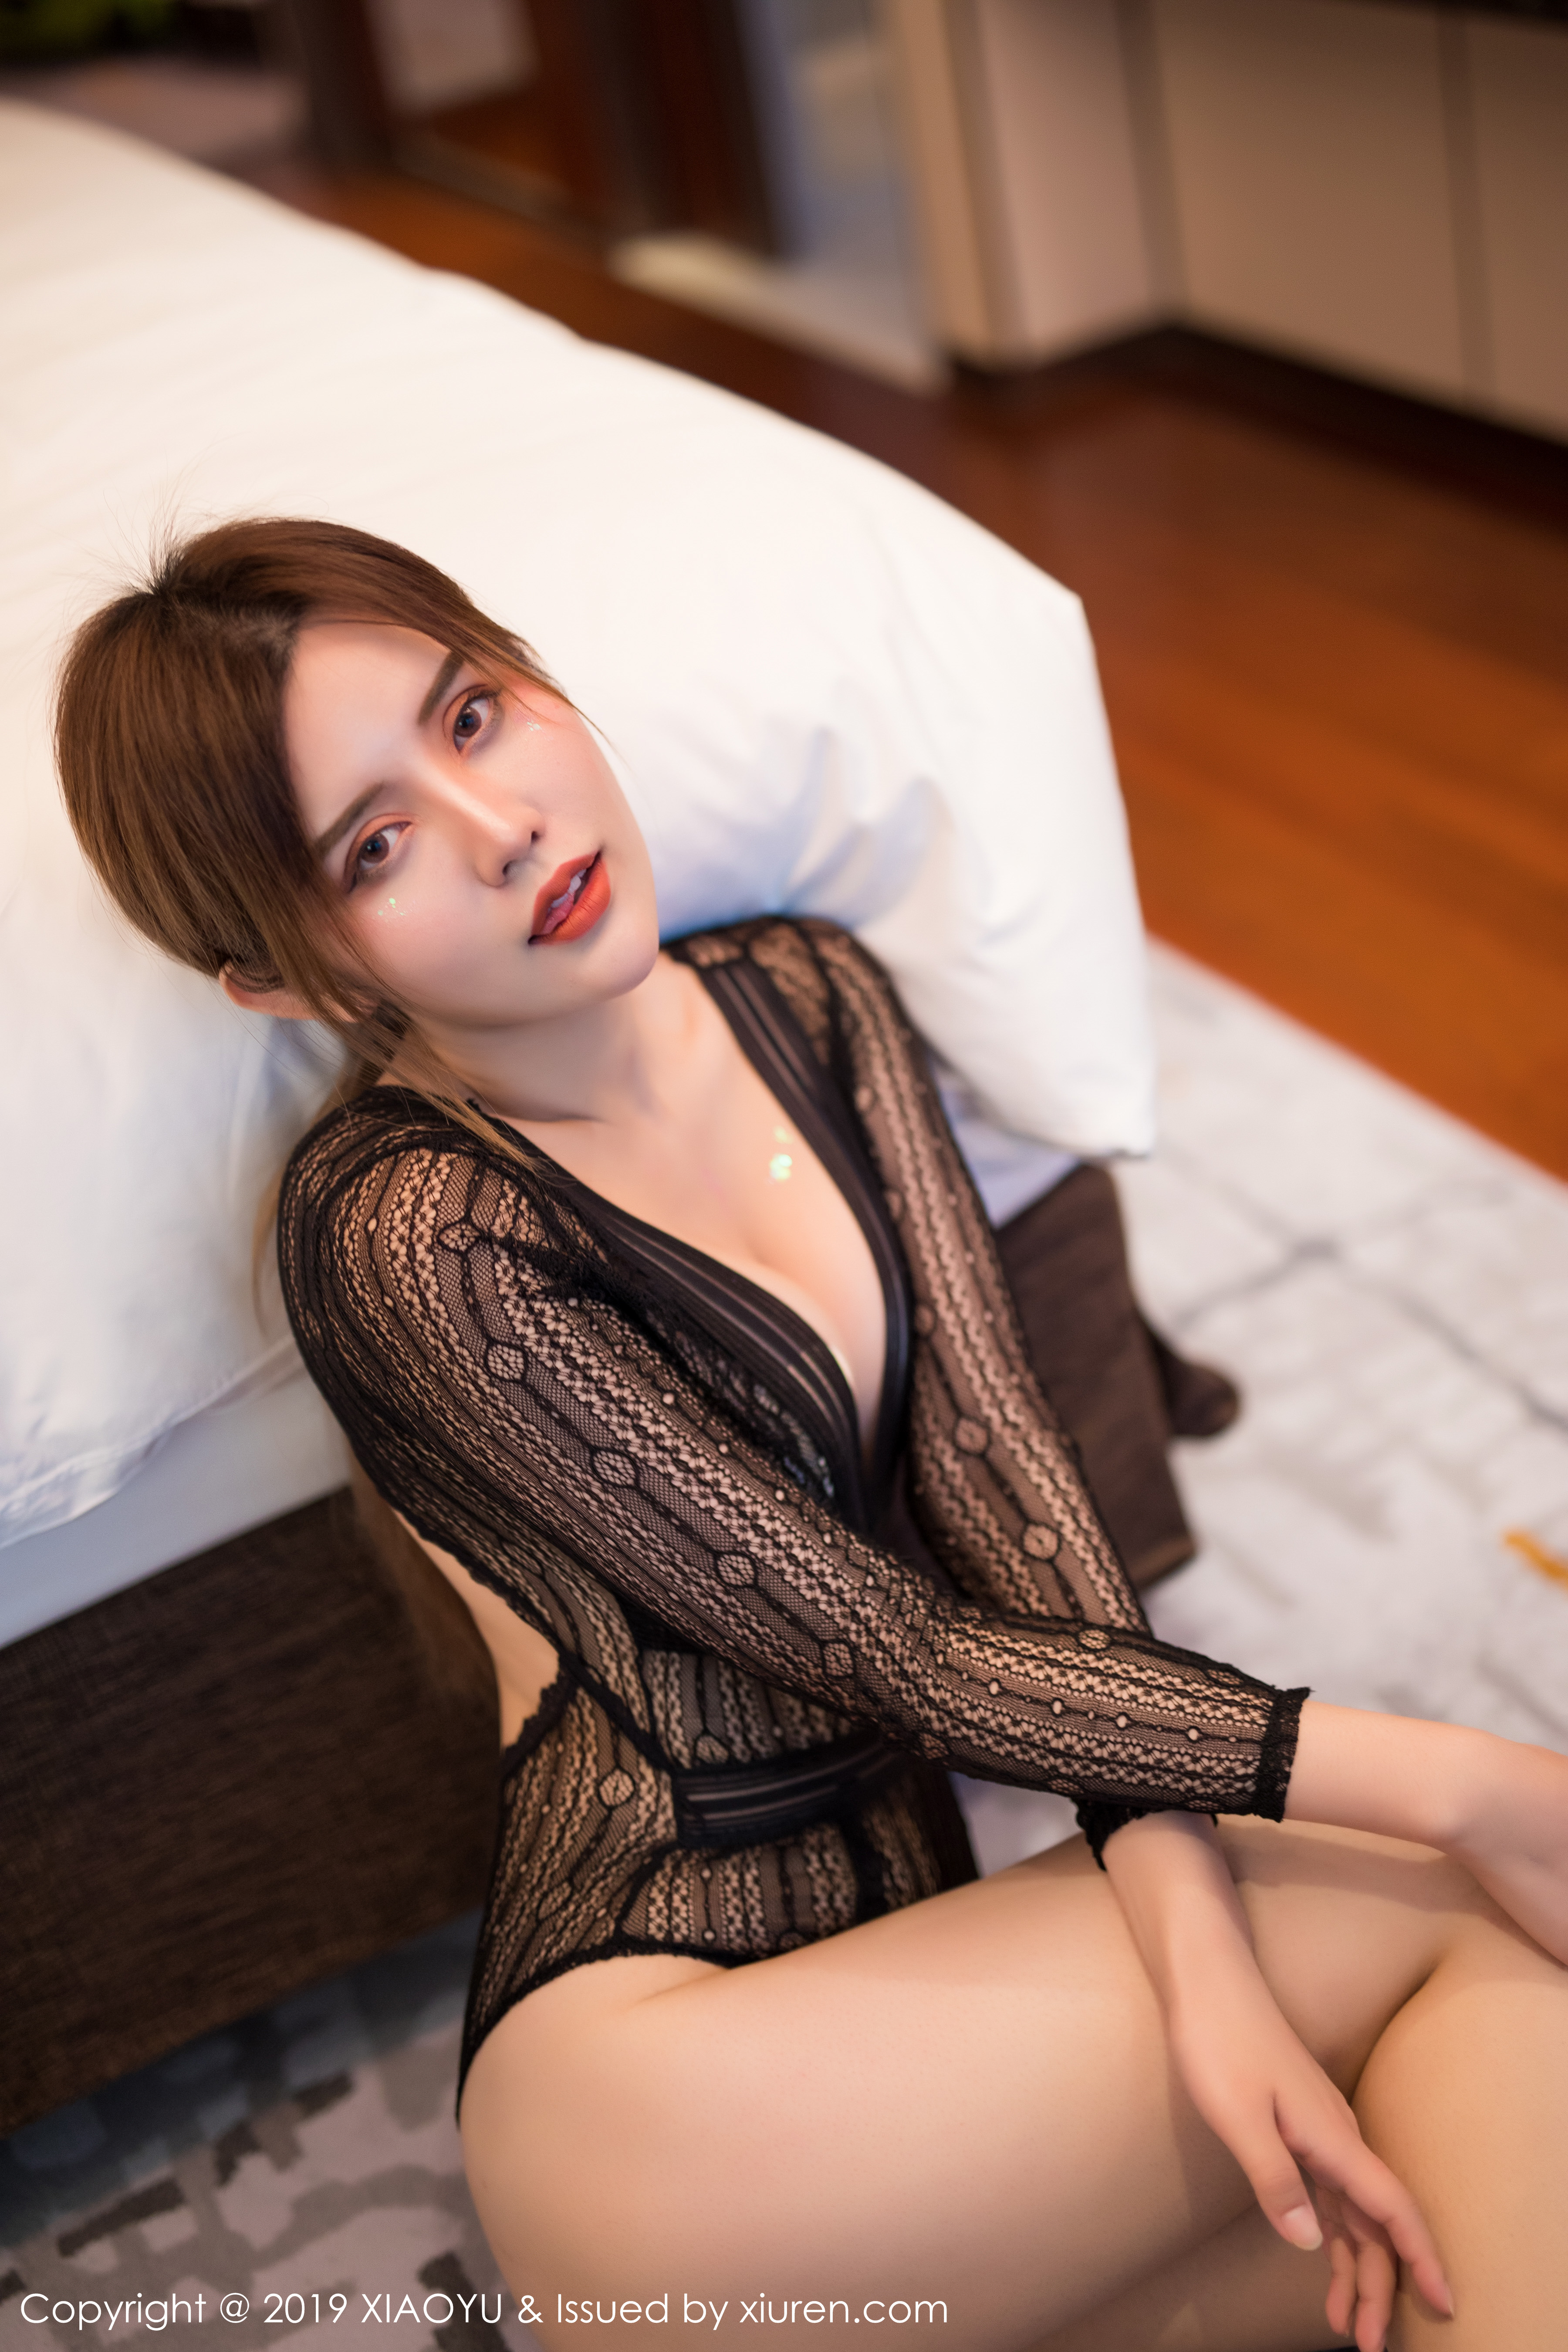 XIAOYU.064 cris_卓娅祺 女神連體衣 - 貼圖 - 清涼寫真 -